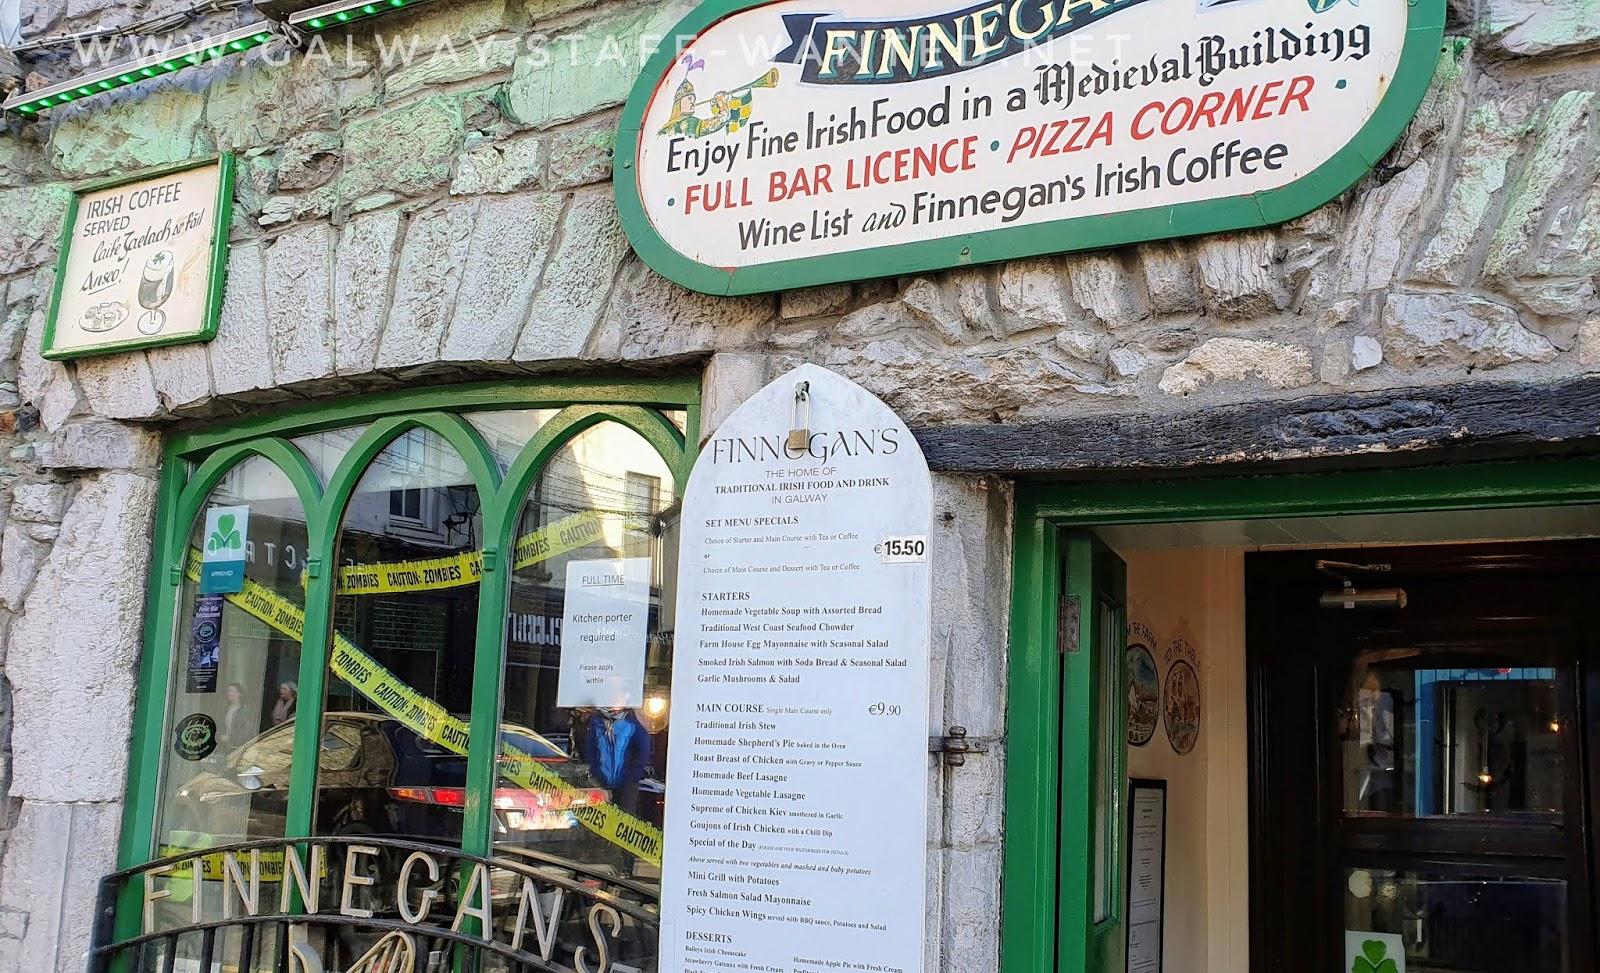 sign in Irish restaurant window with Halloween decorations - and Finnegans restaurant menu board - main €15.50.